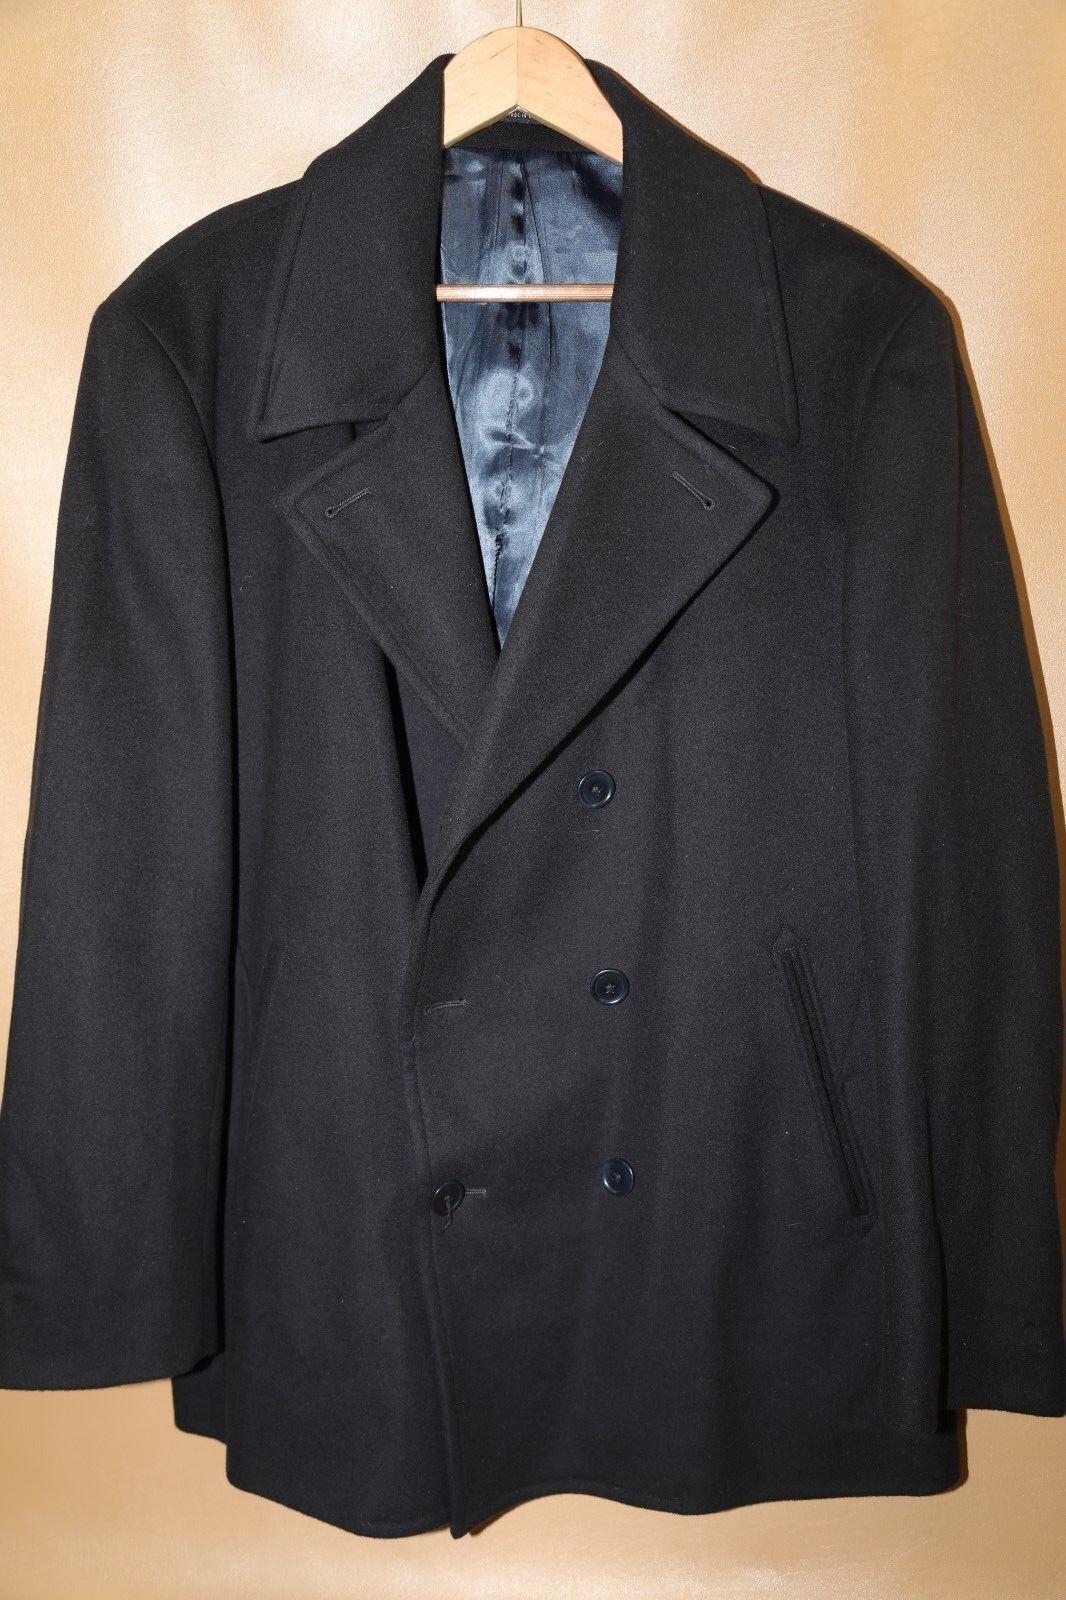 124 JOHN VARVATOS STAR USA  Wool & Cashmere Pea Coat Größe 44 R